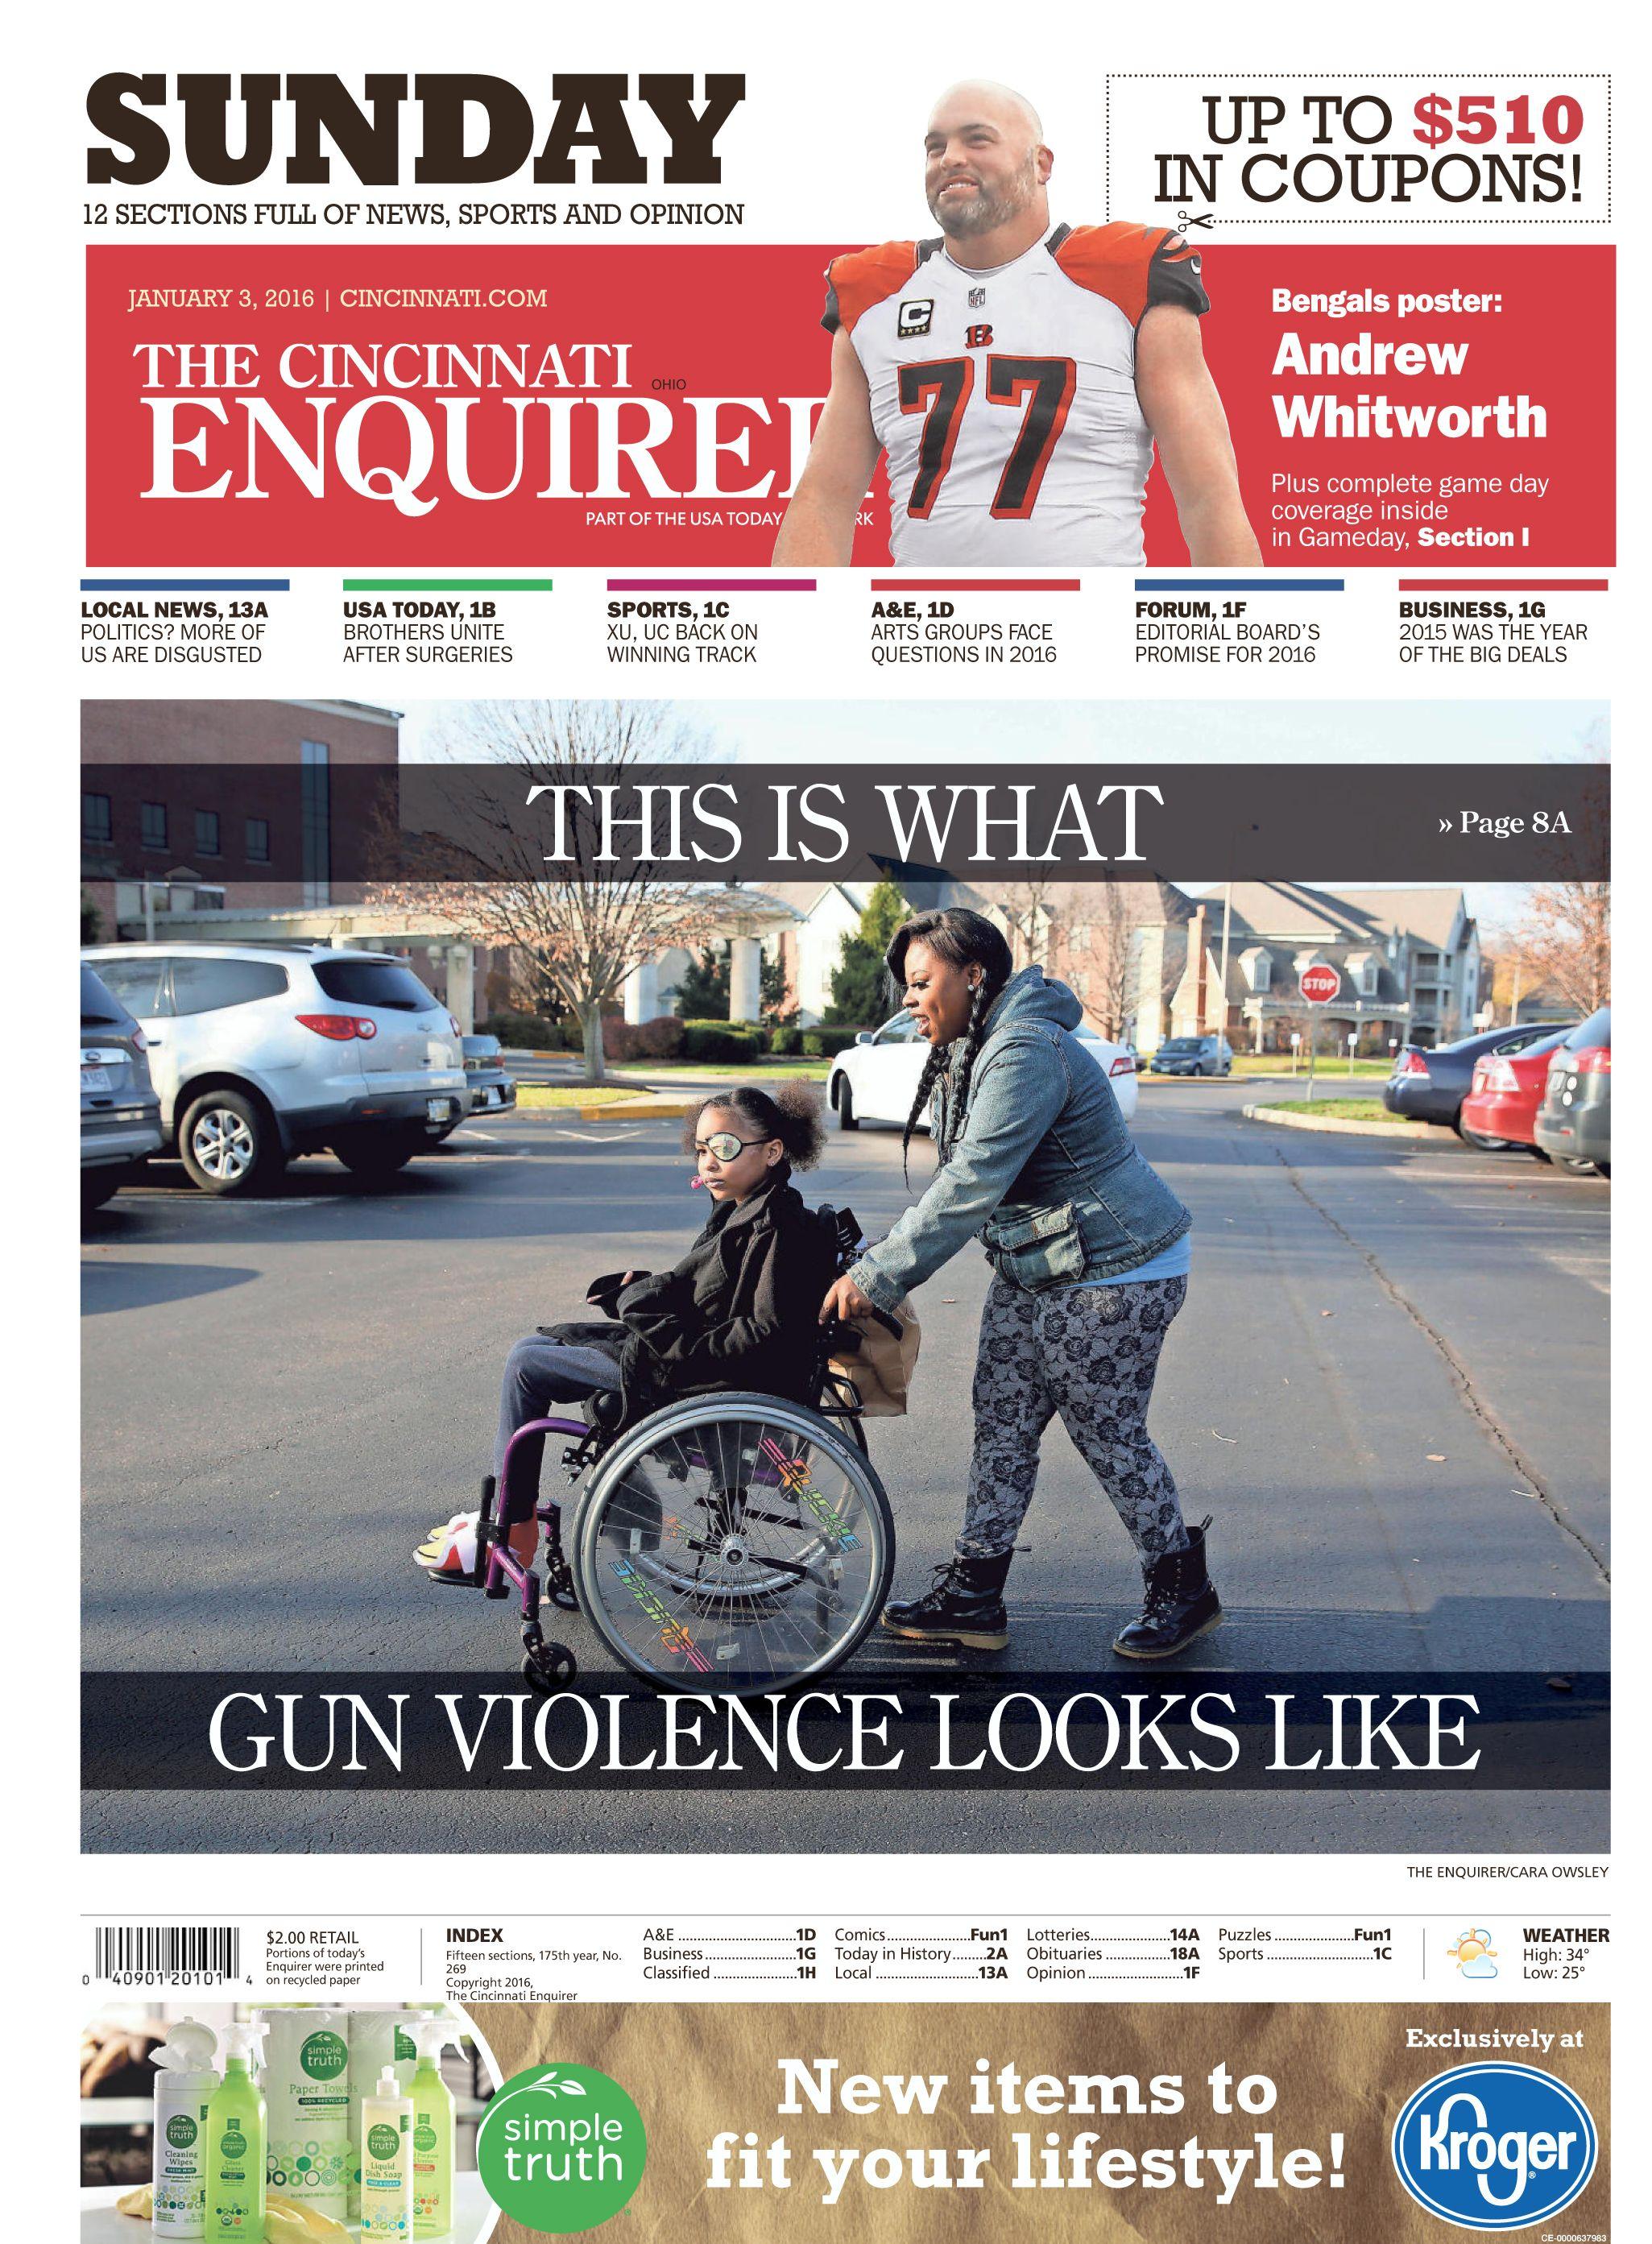 The Cincinnati Enquirer's front page, Sunday, Jan. 3, 2016